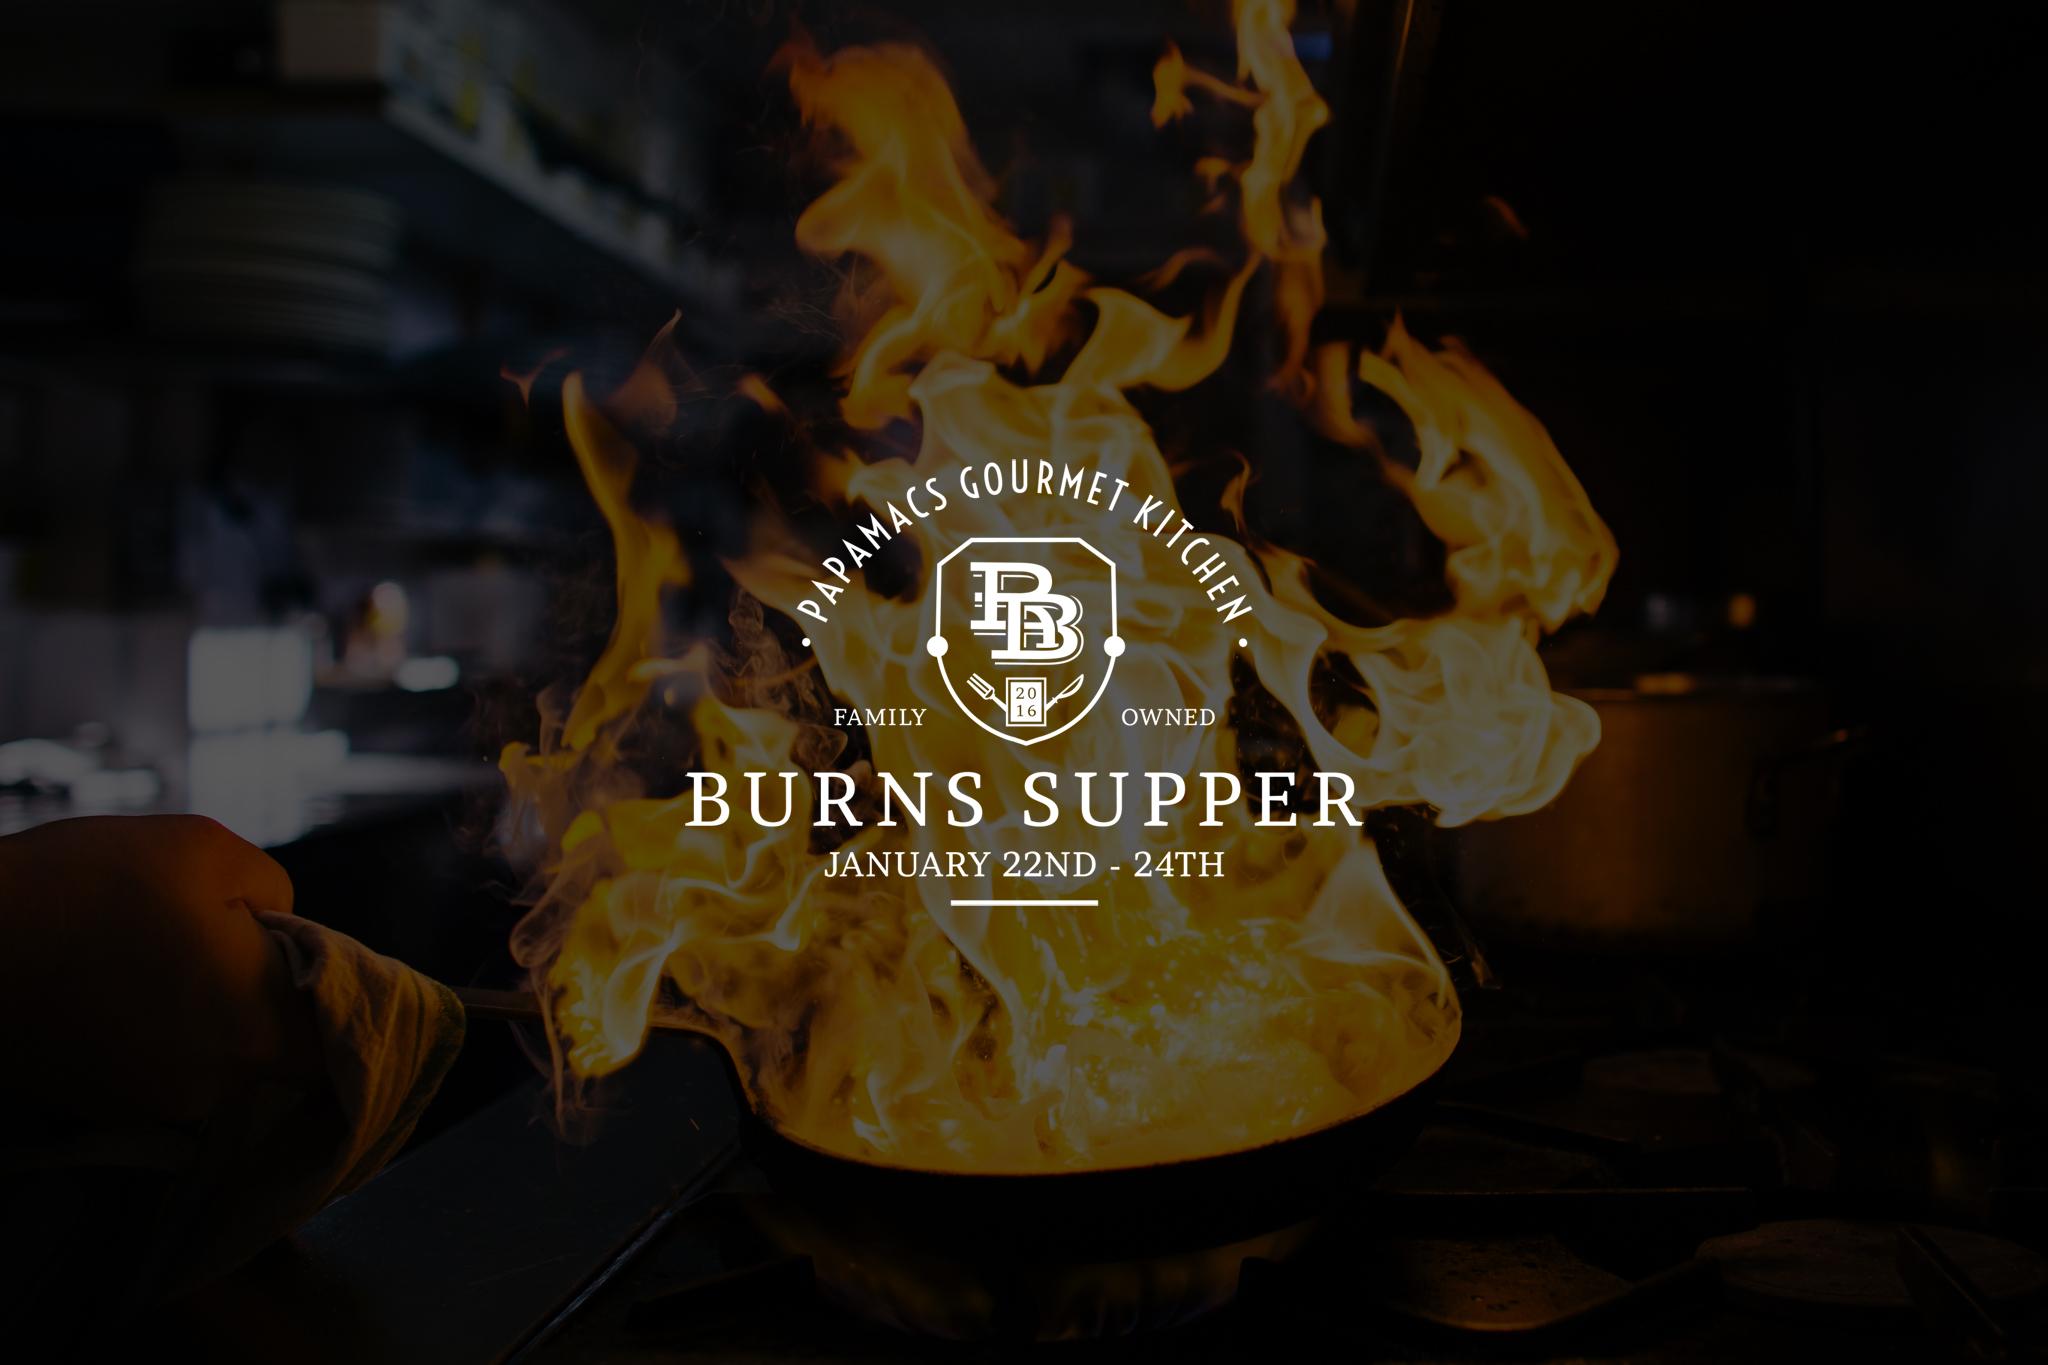 Papamacs-Burns-Supper-2016-FB-02.JPG